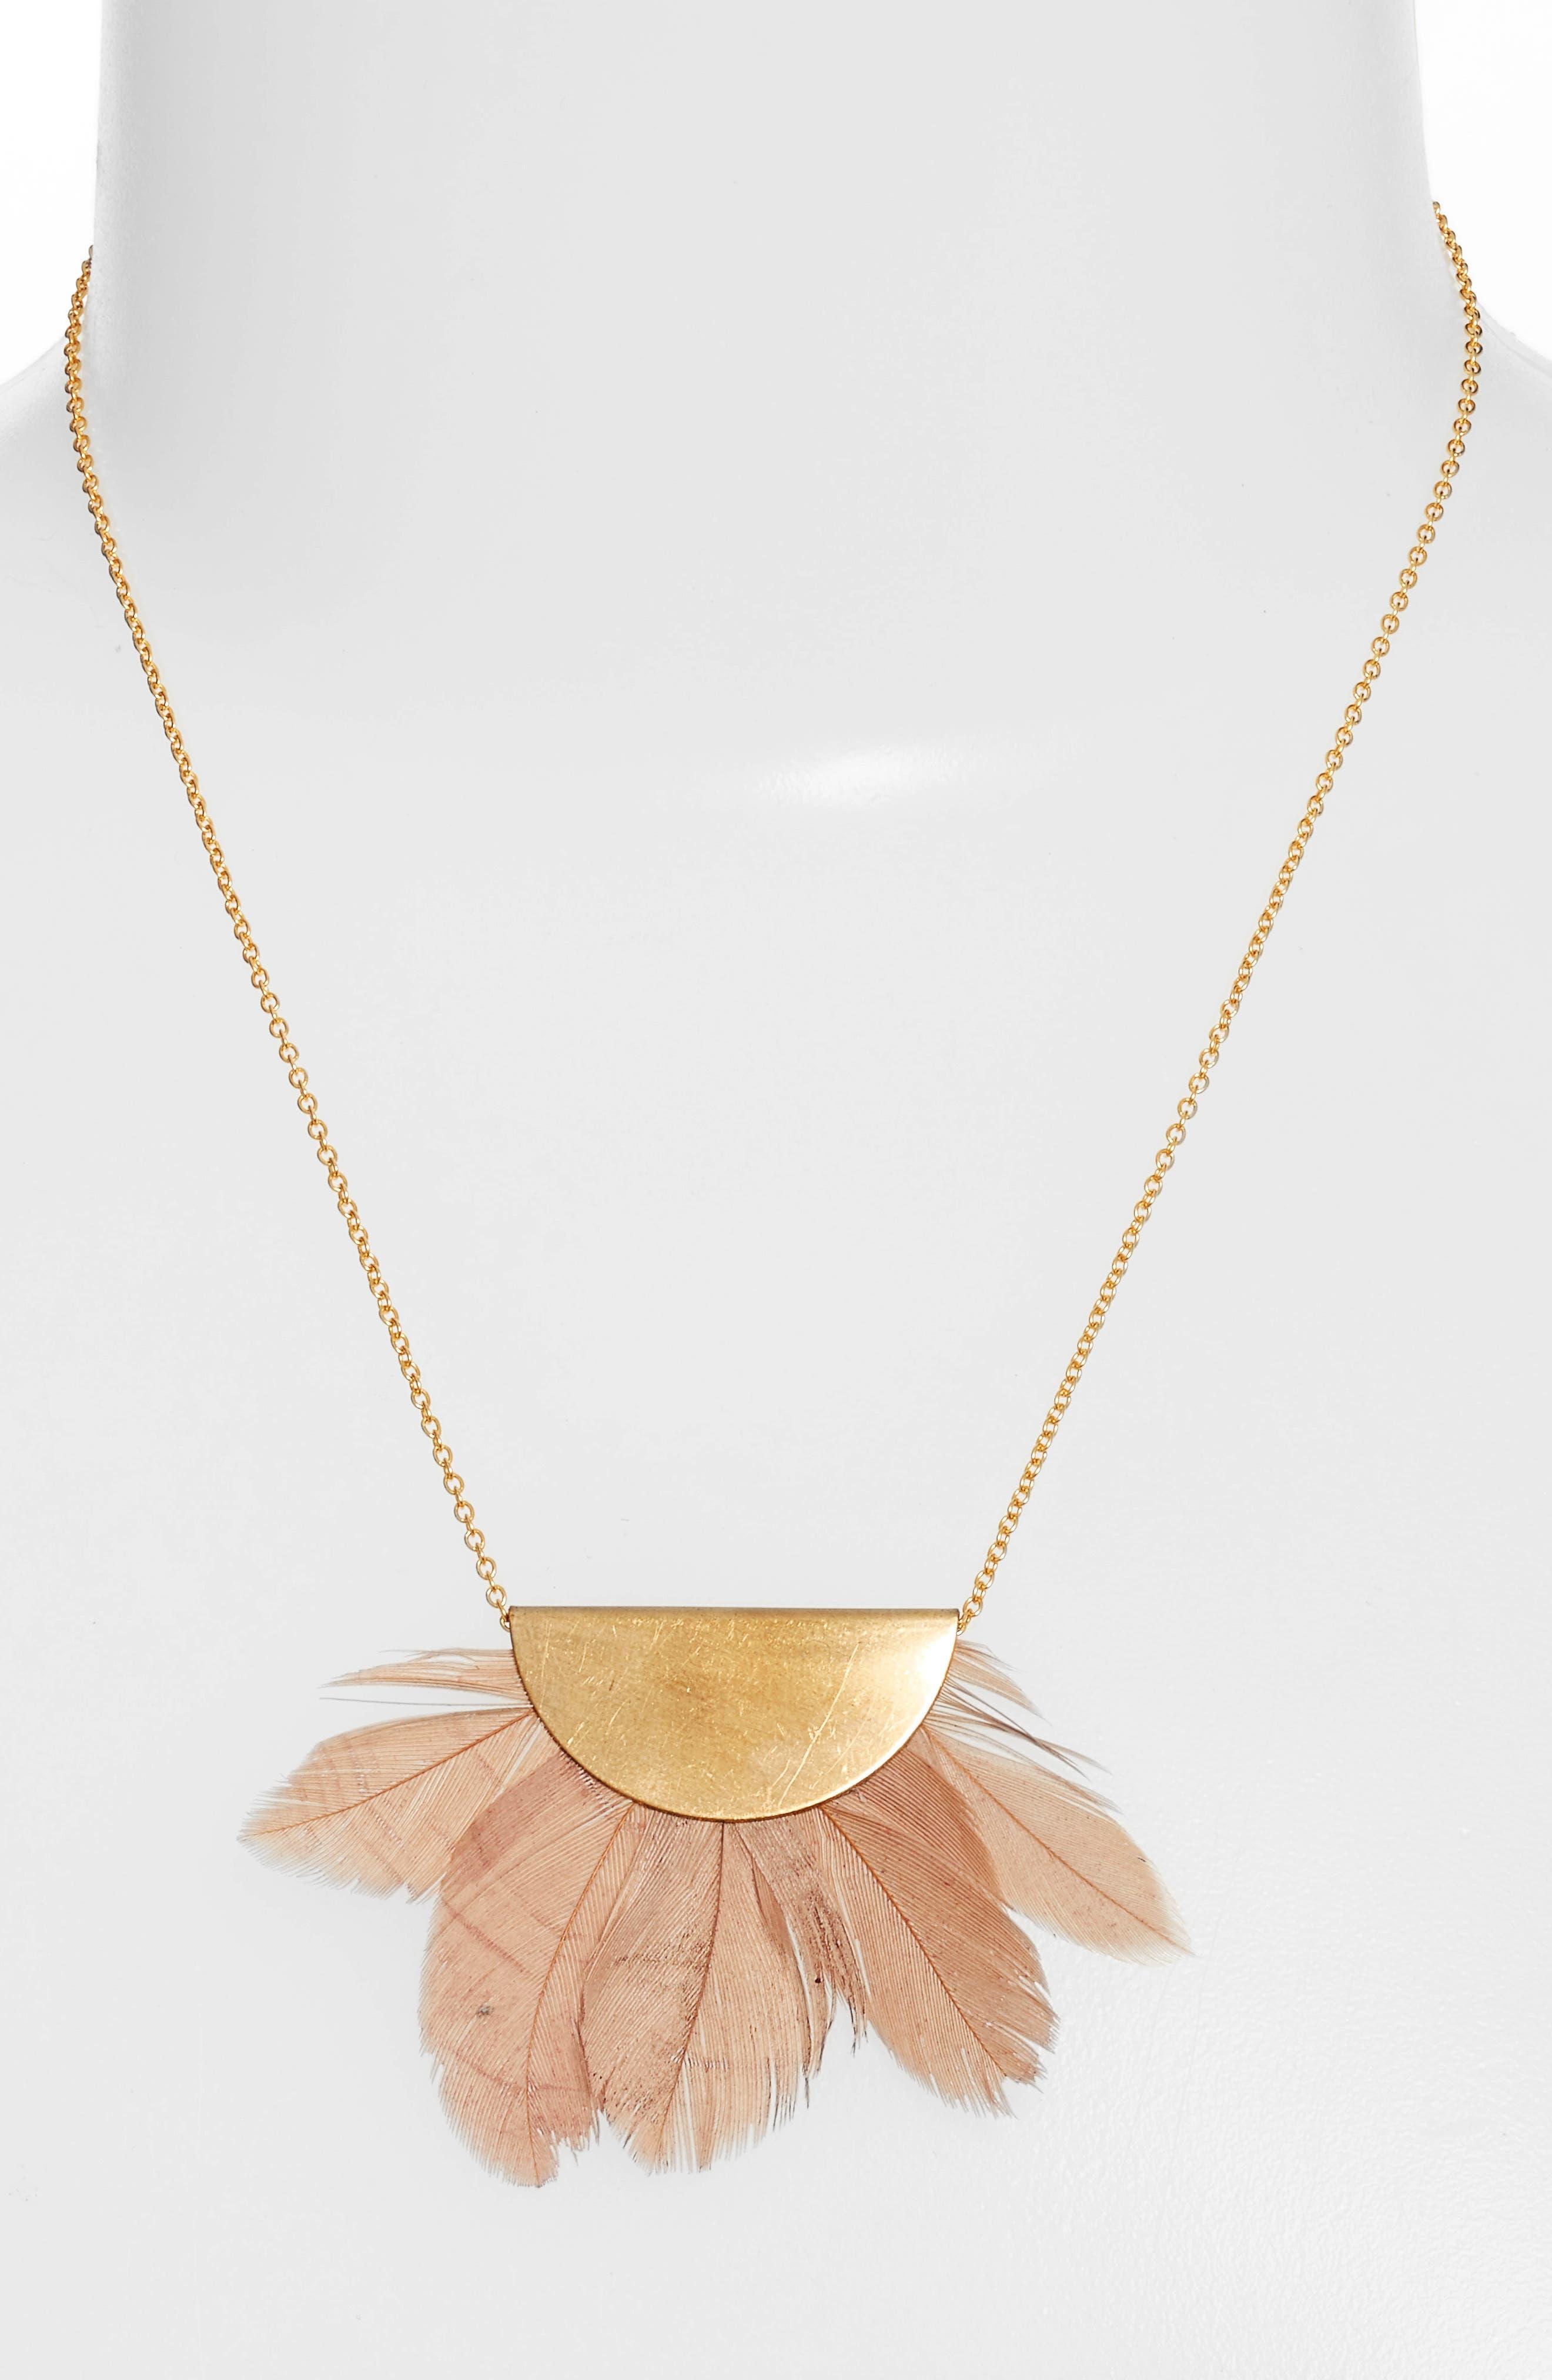 Feather Fan Pendant Necklace,                             Alternate thumbnail 2, color,                             Gold/ Blush